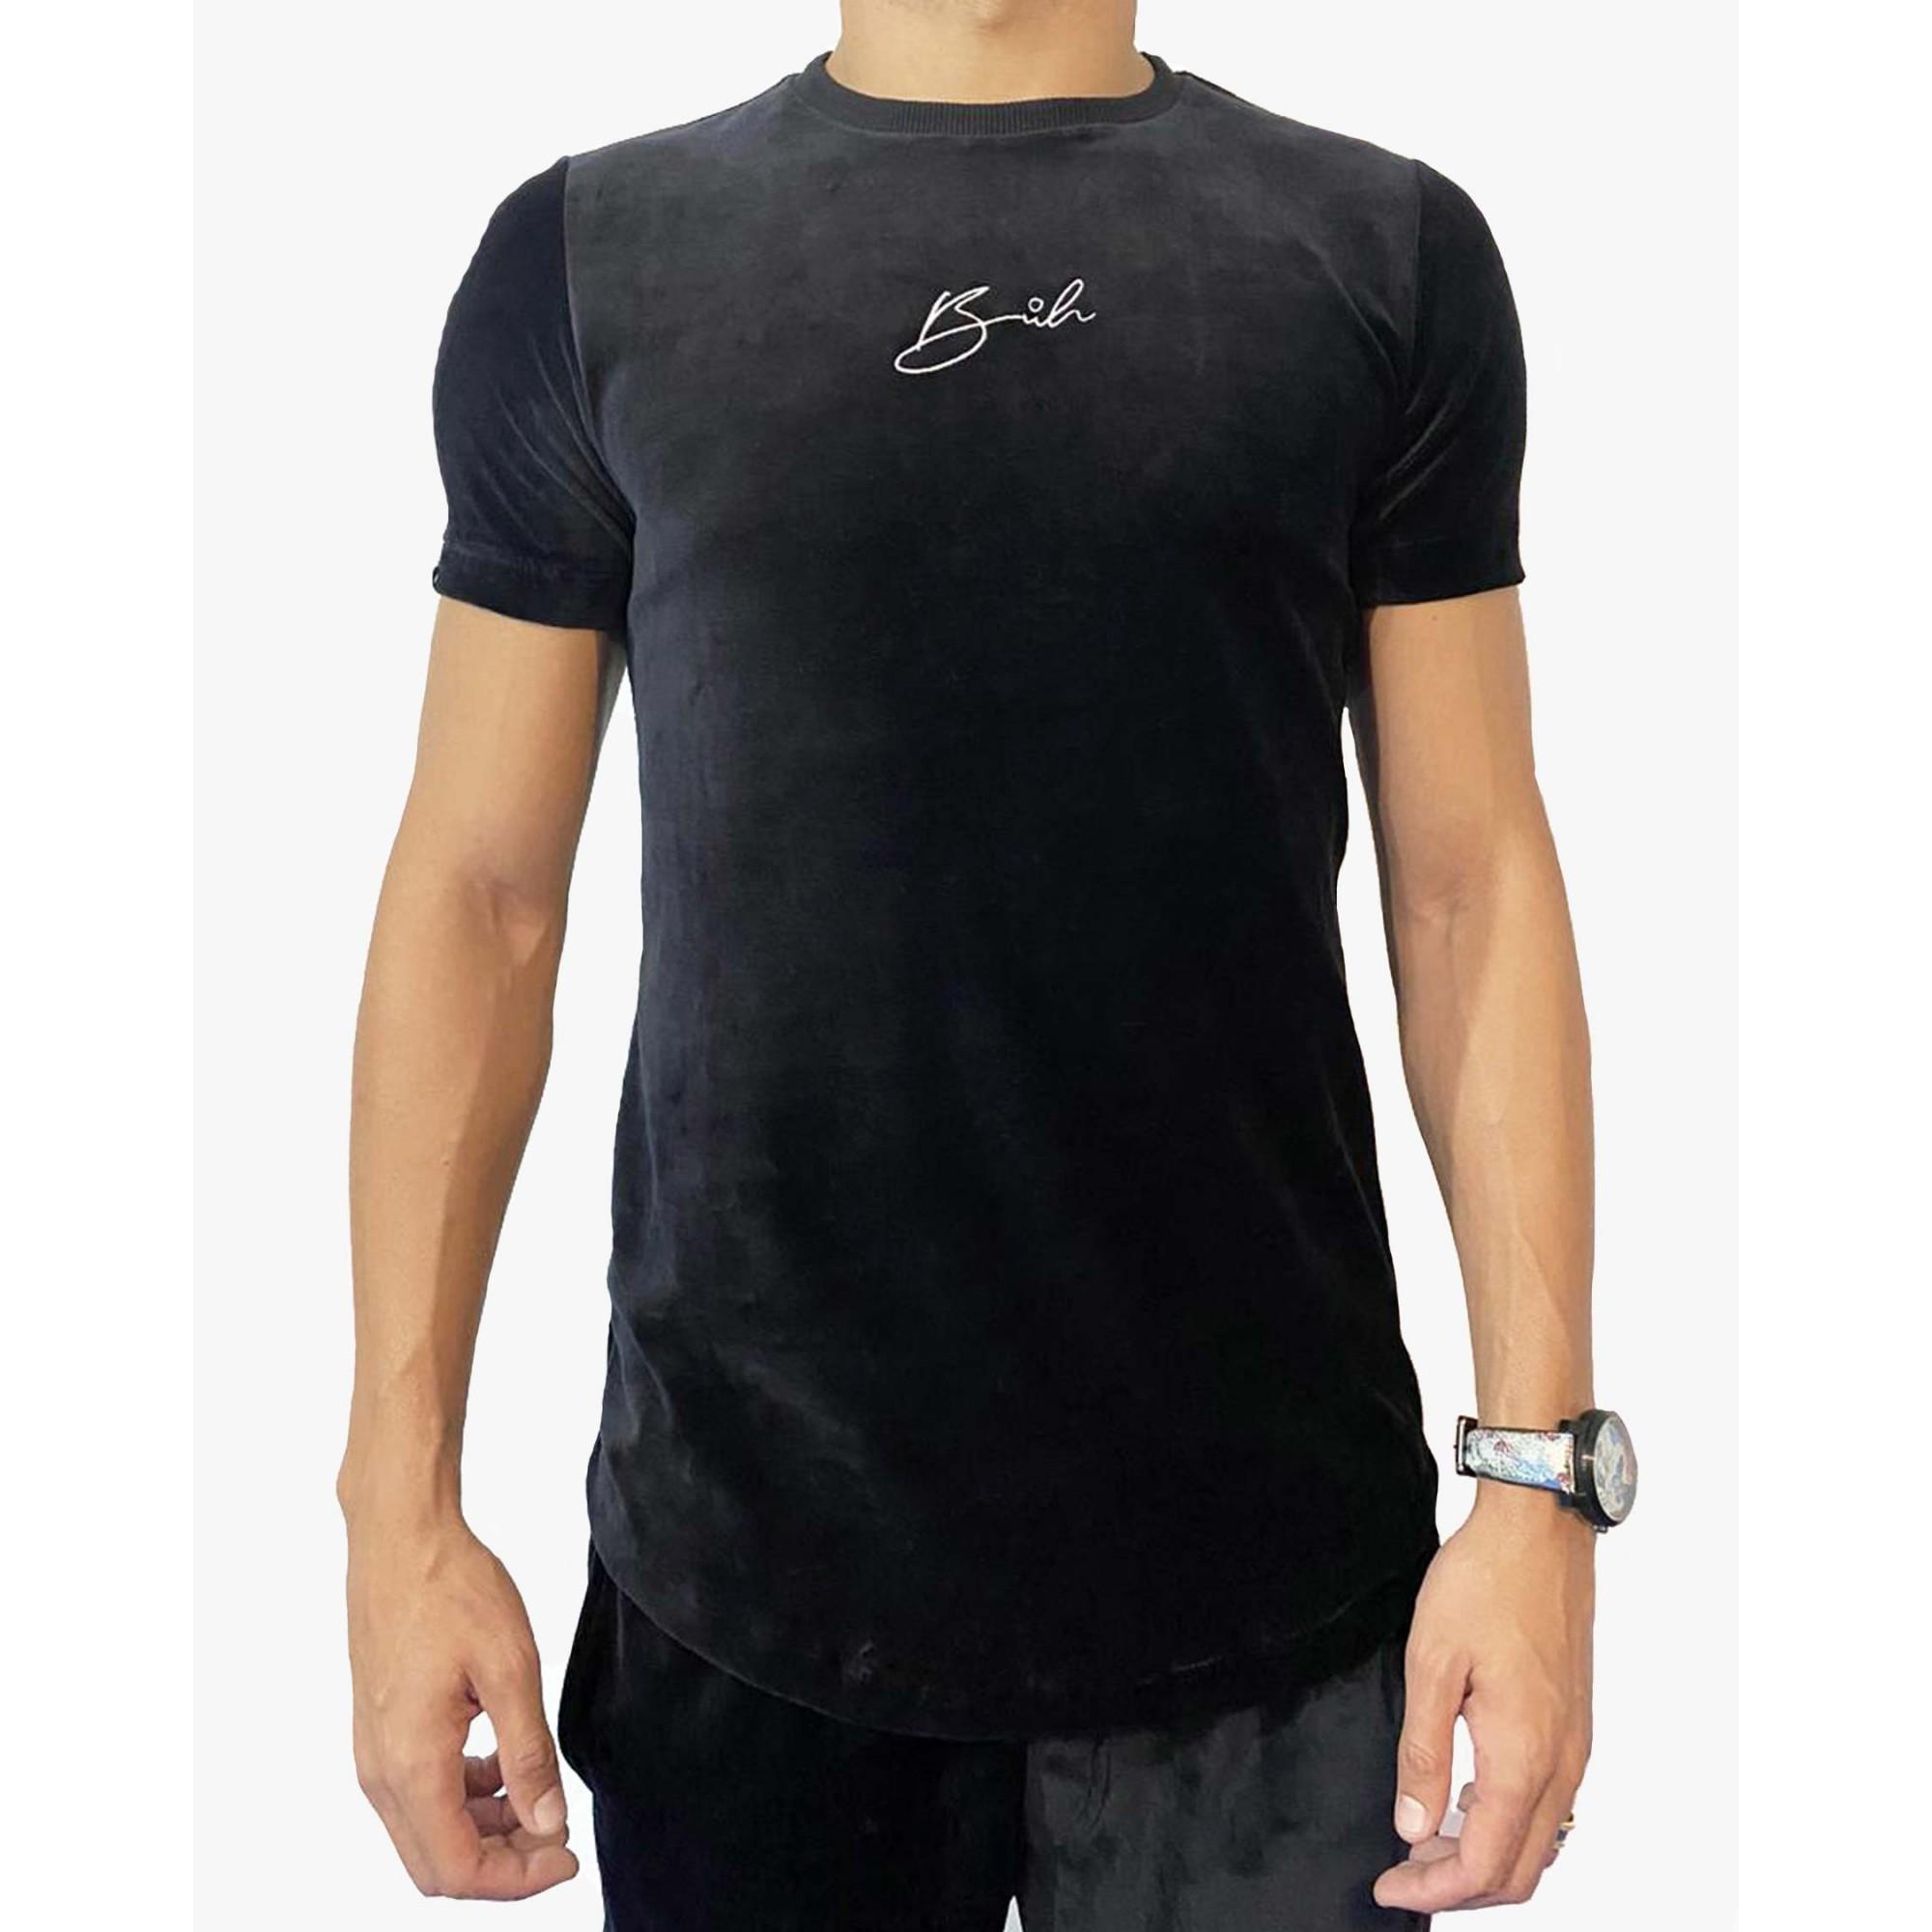 Camiseta Buh Bordado Plush Black